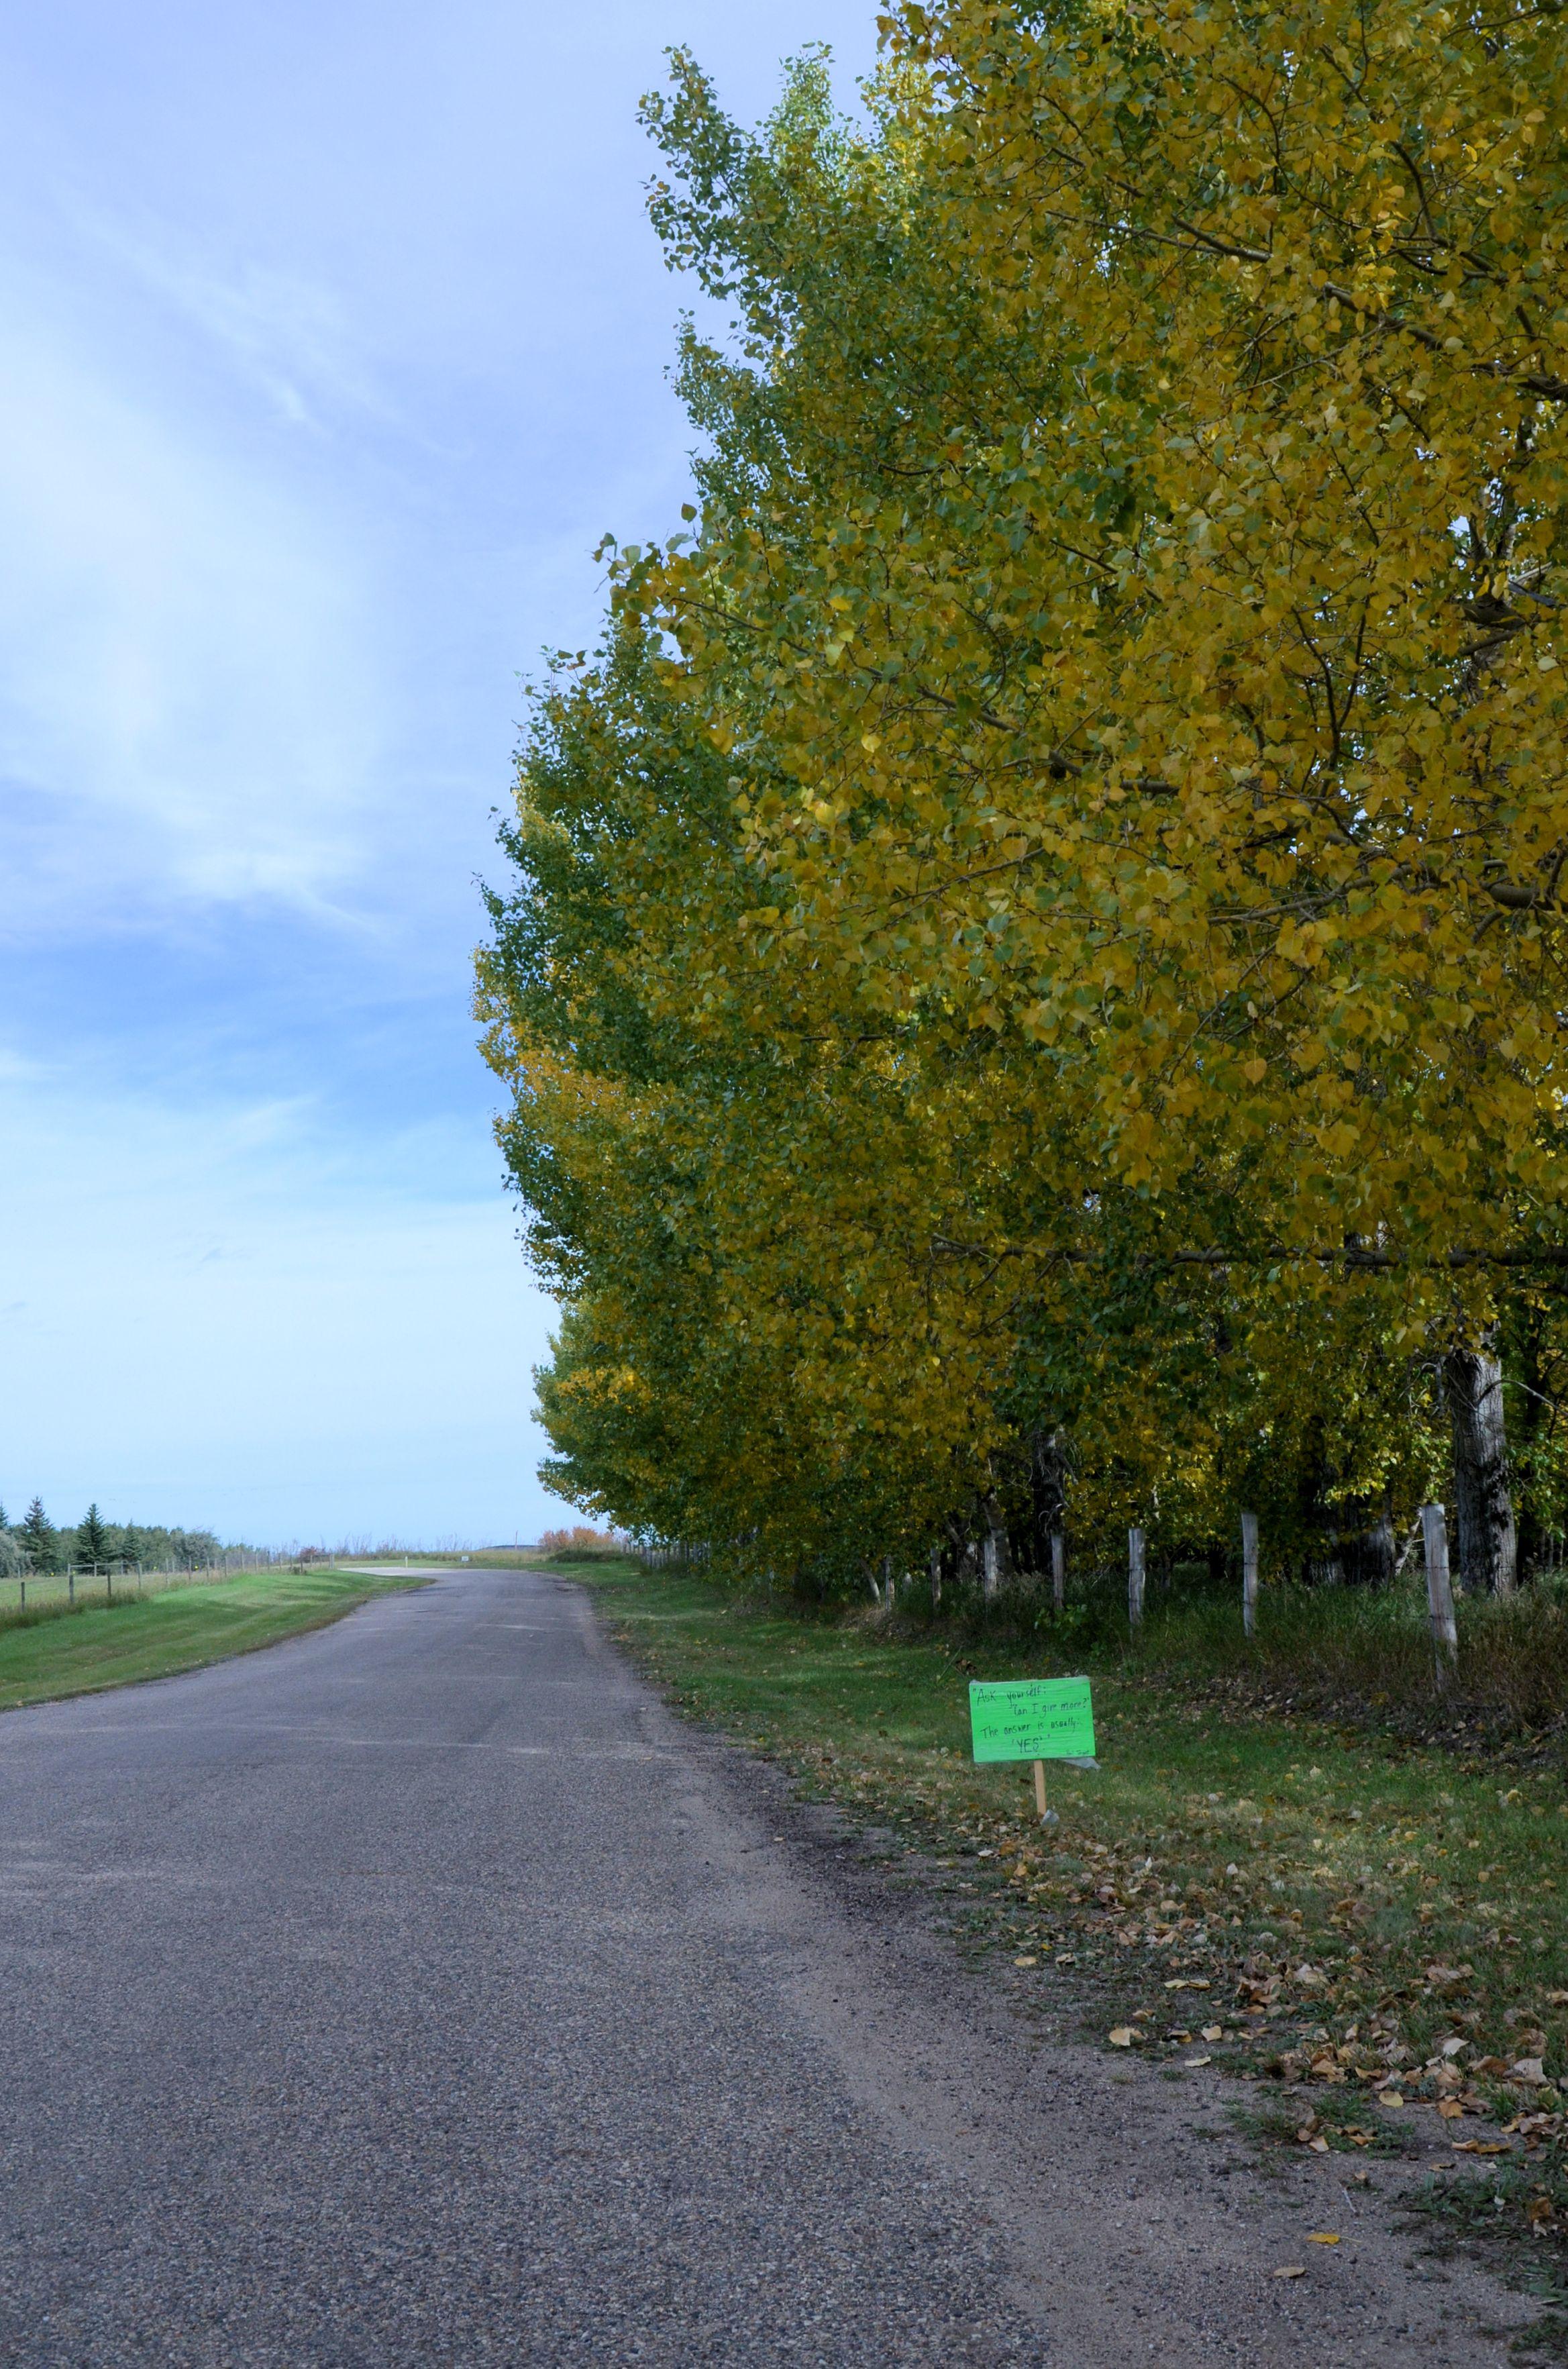 run sign & trees